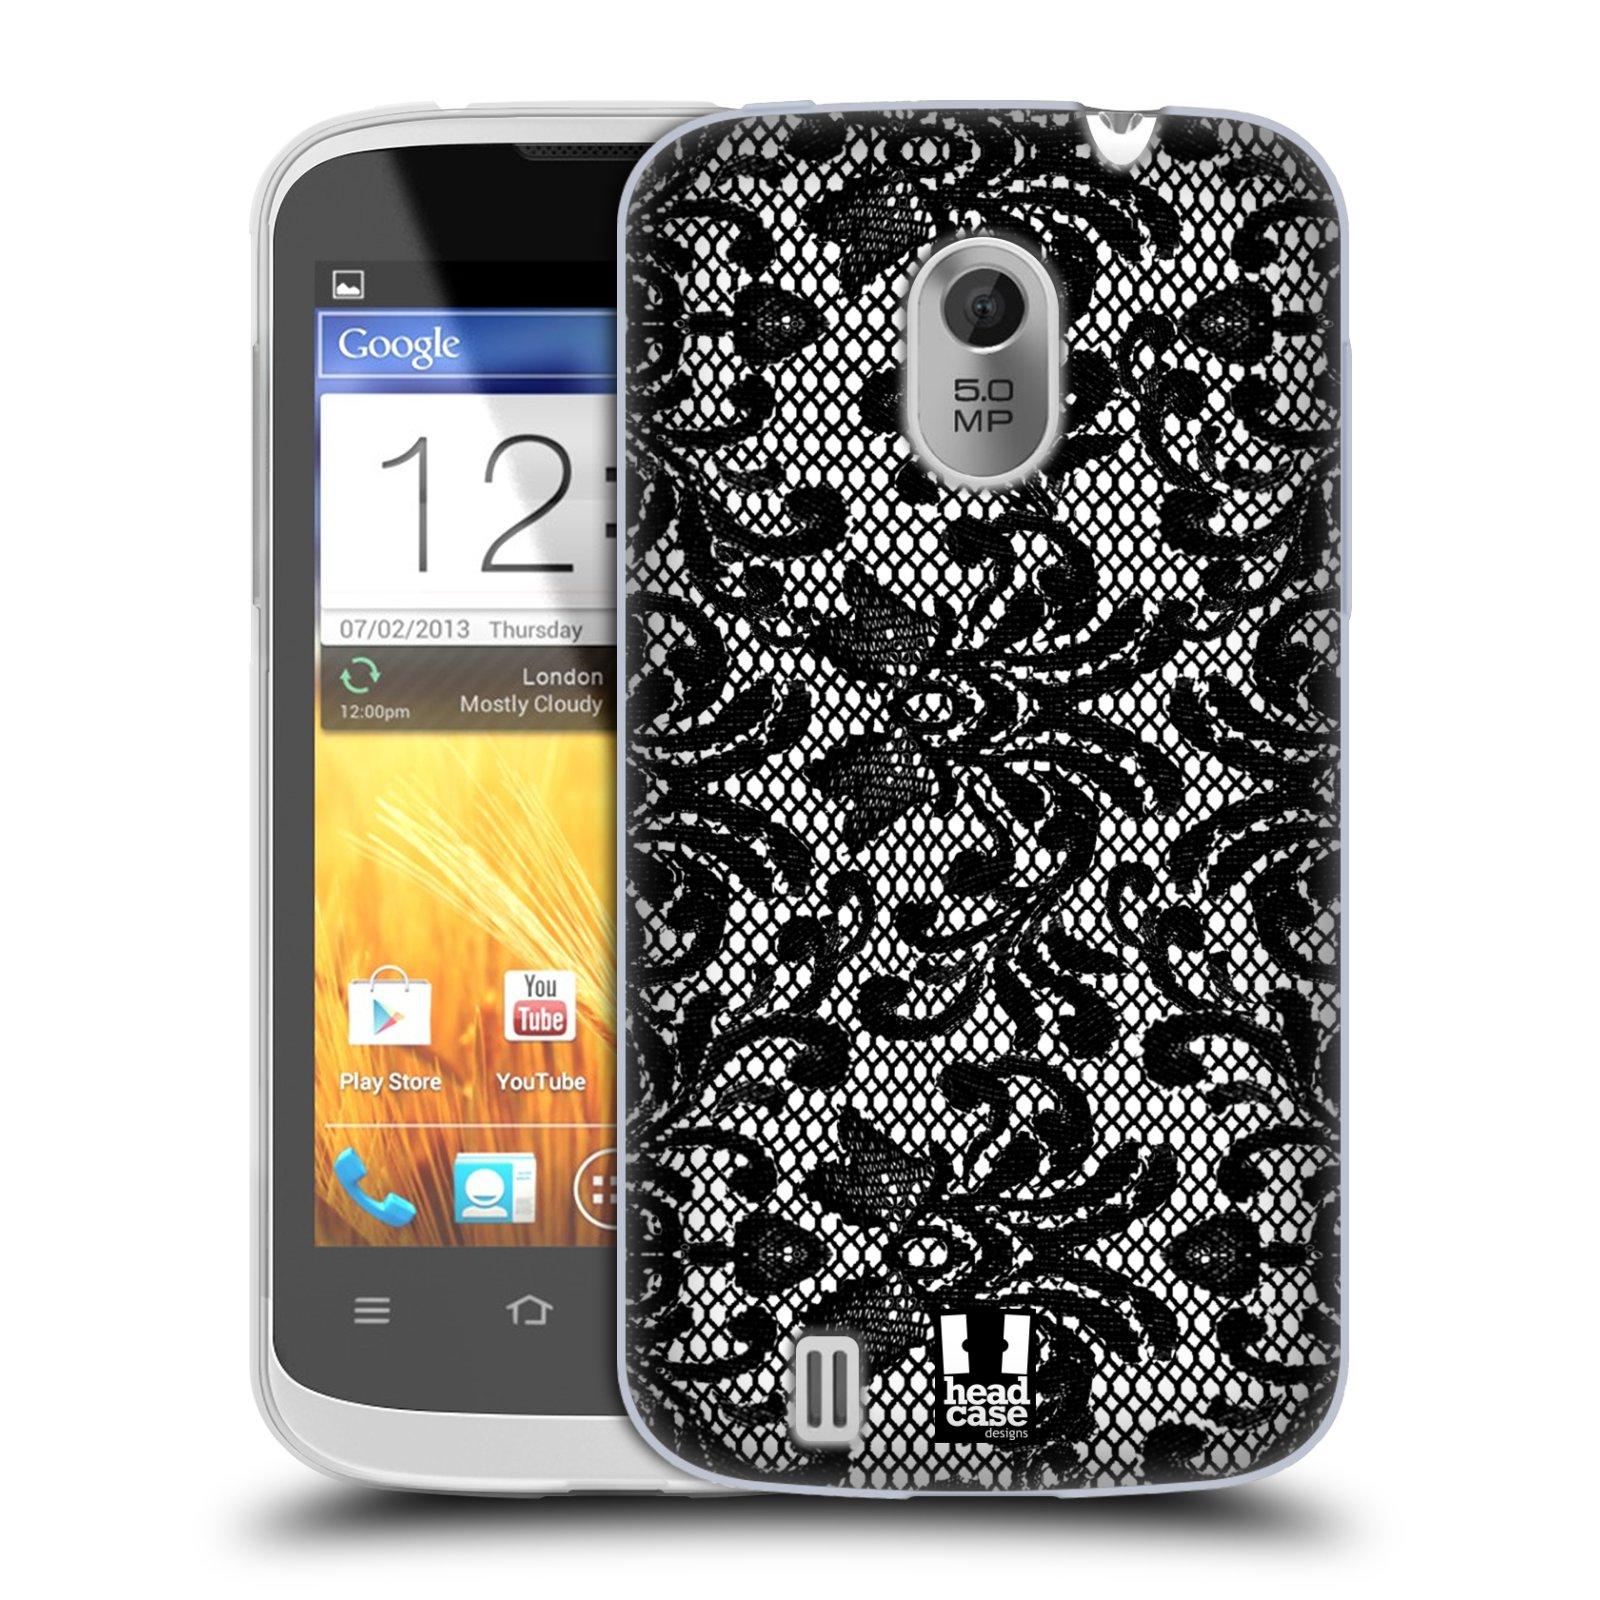 Silikonové pouzdro na mobil ZTE Blade III HEAD CASE KRAJKA (Silikonový kryt či obal na mobilní telefon ZTE Blade 3)